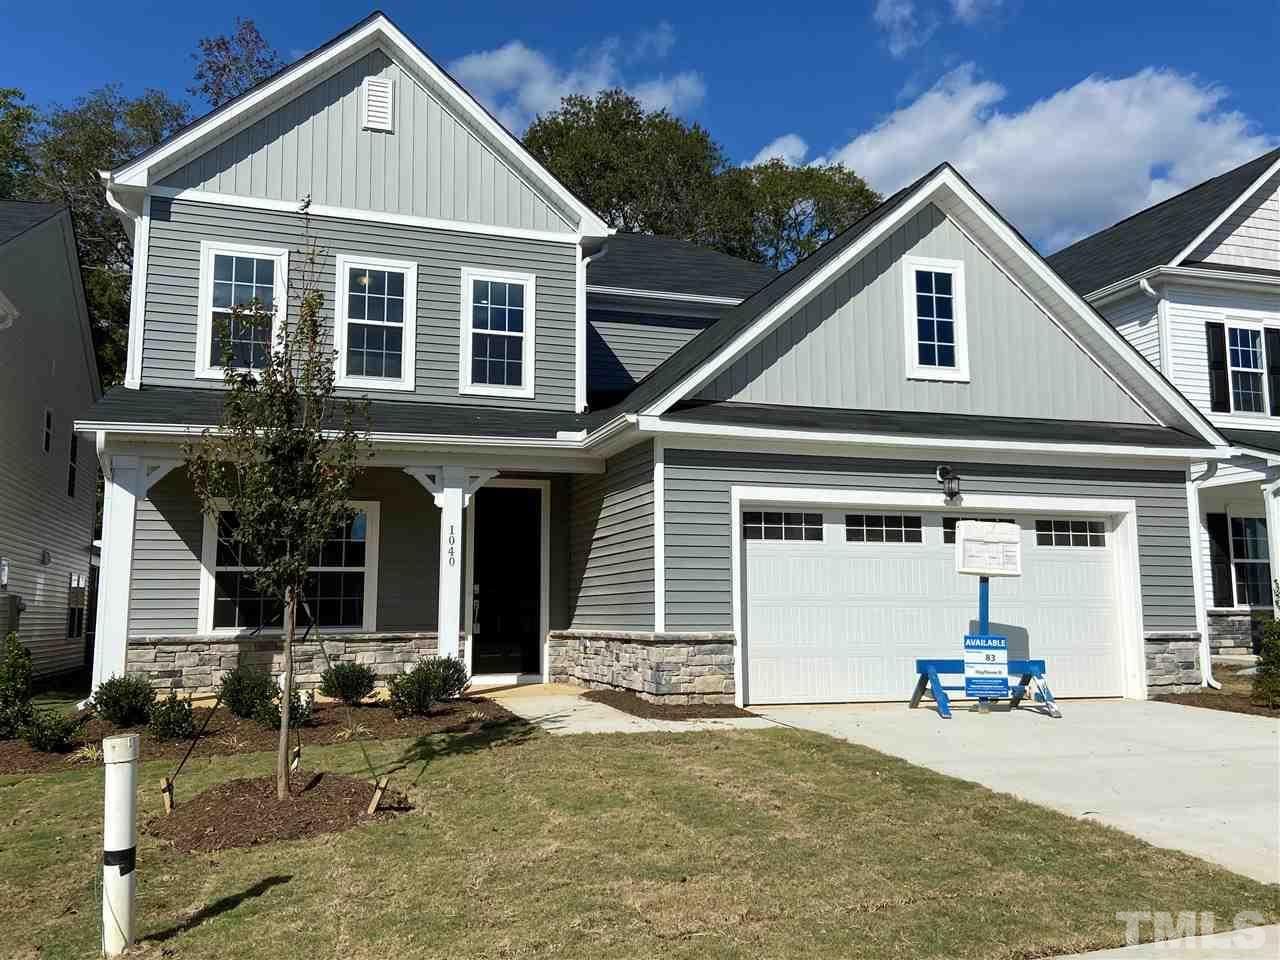 1040 Bellewood Park Drive #83 - Mayflower C, Angier, NC 27501 - MLS#: 2304967